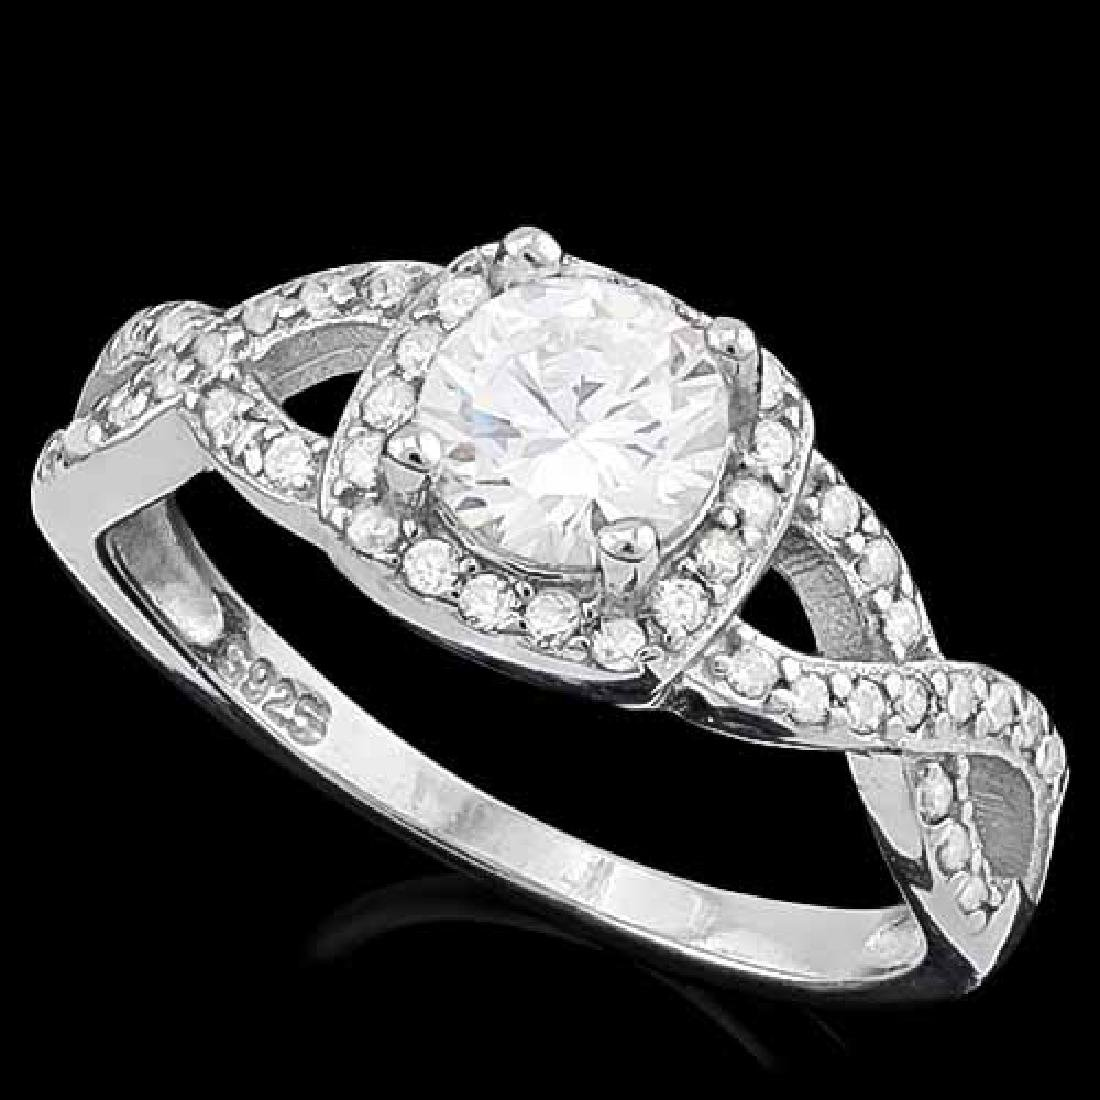 1 1/2 CARAT (49 PCS) FLAWLESS CREATED DIAMOND 925 STERL